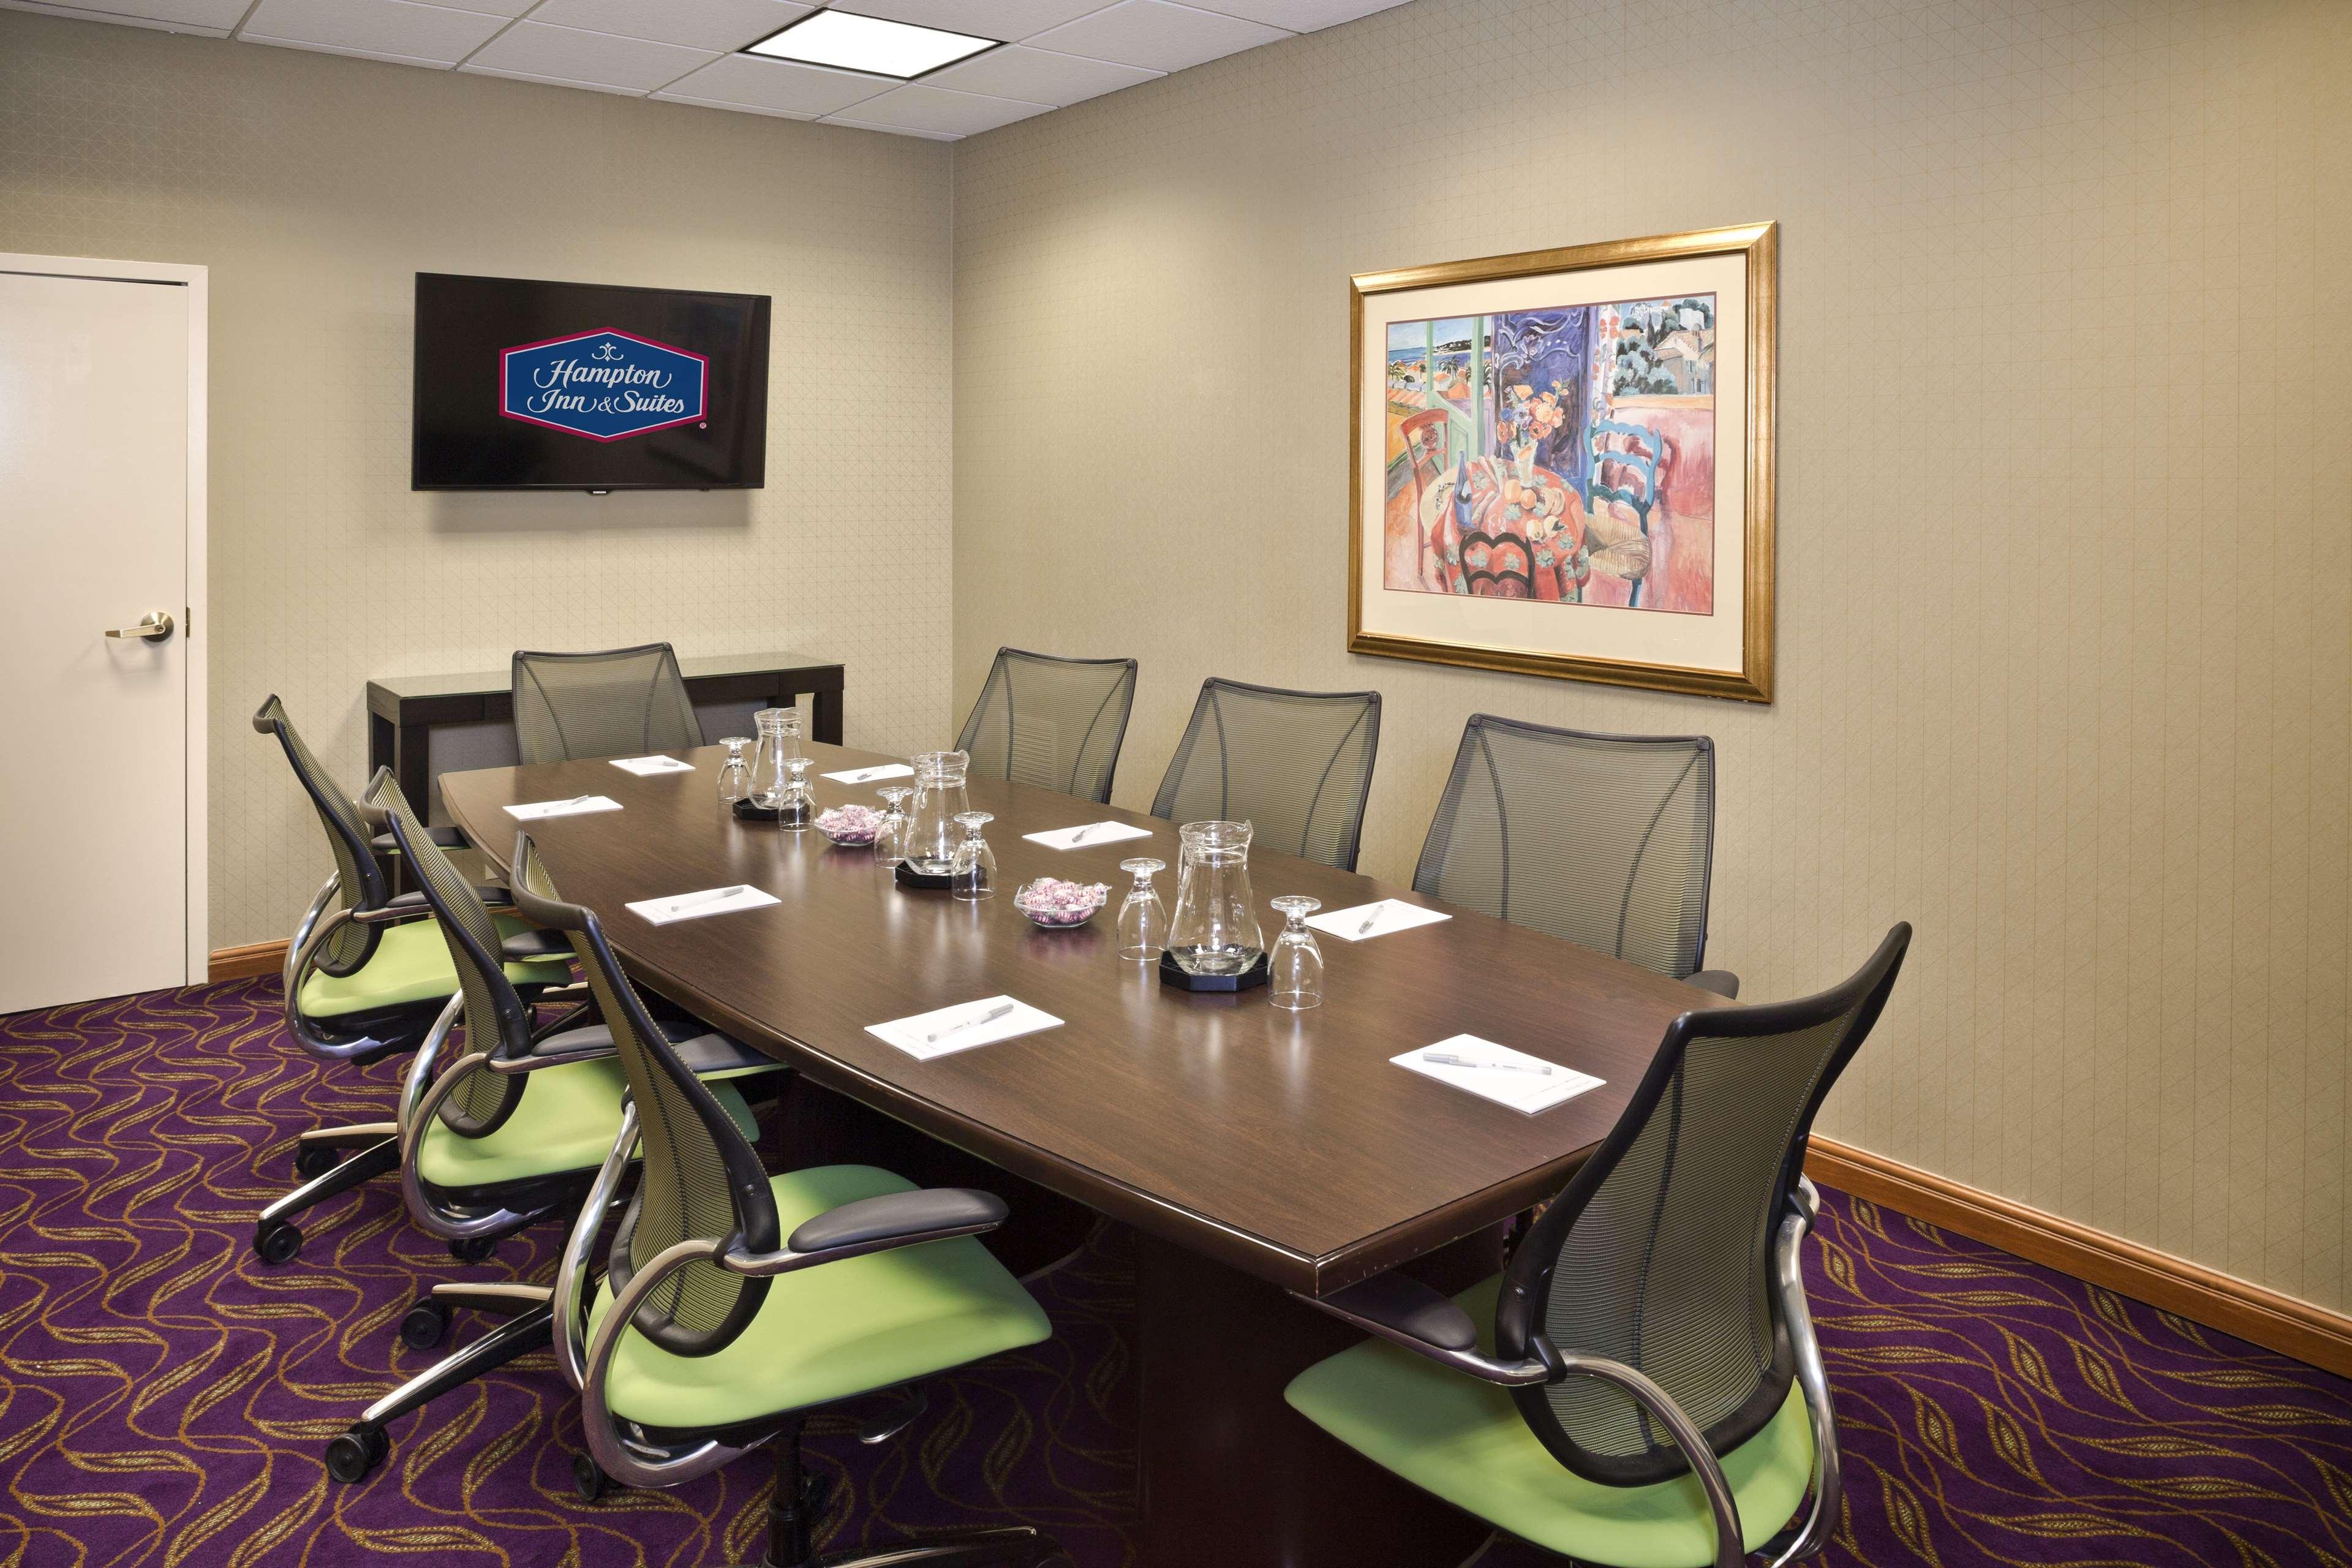 Hampton Inn & Suites Arundel Mills/Baltimore image 20